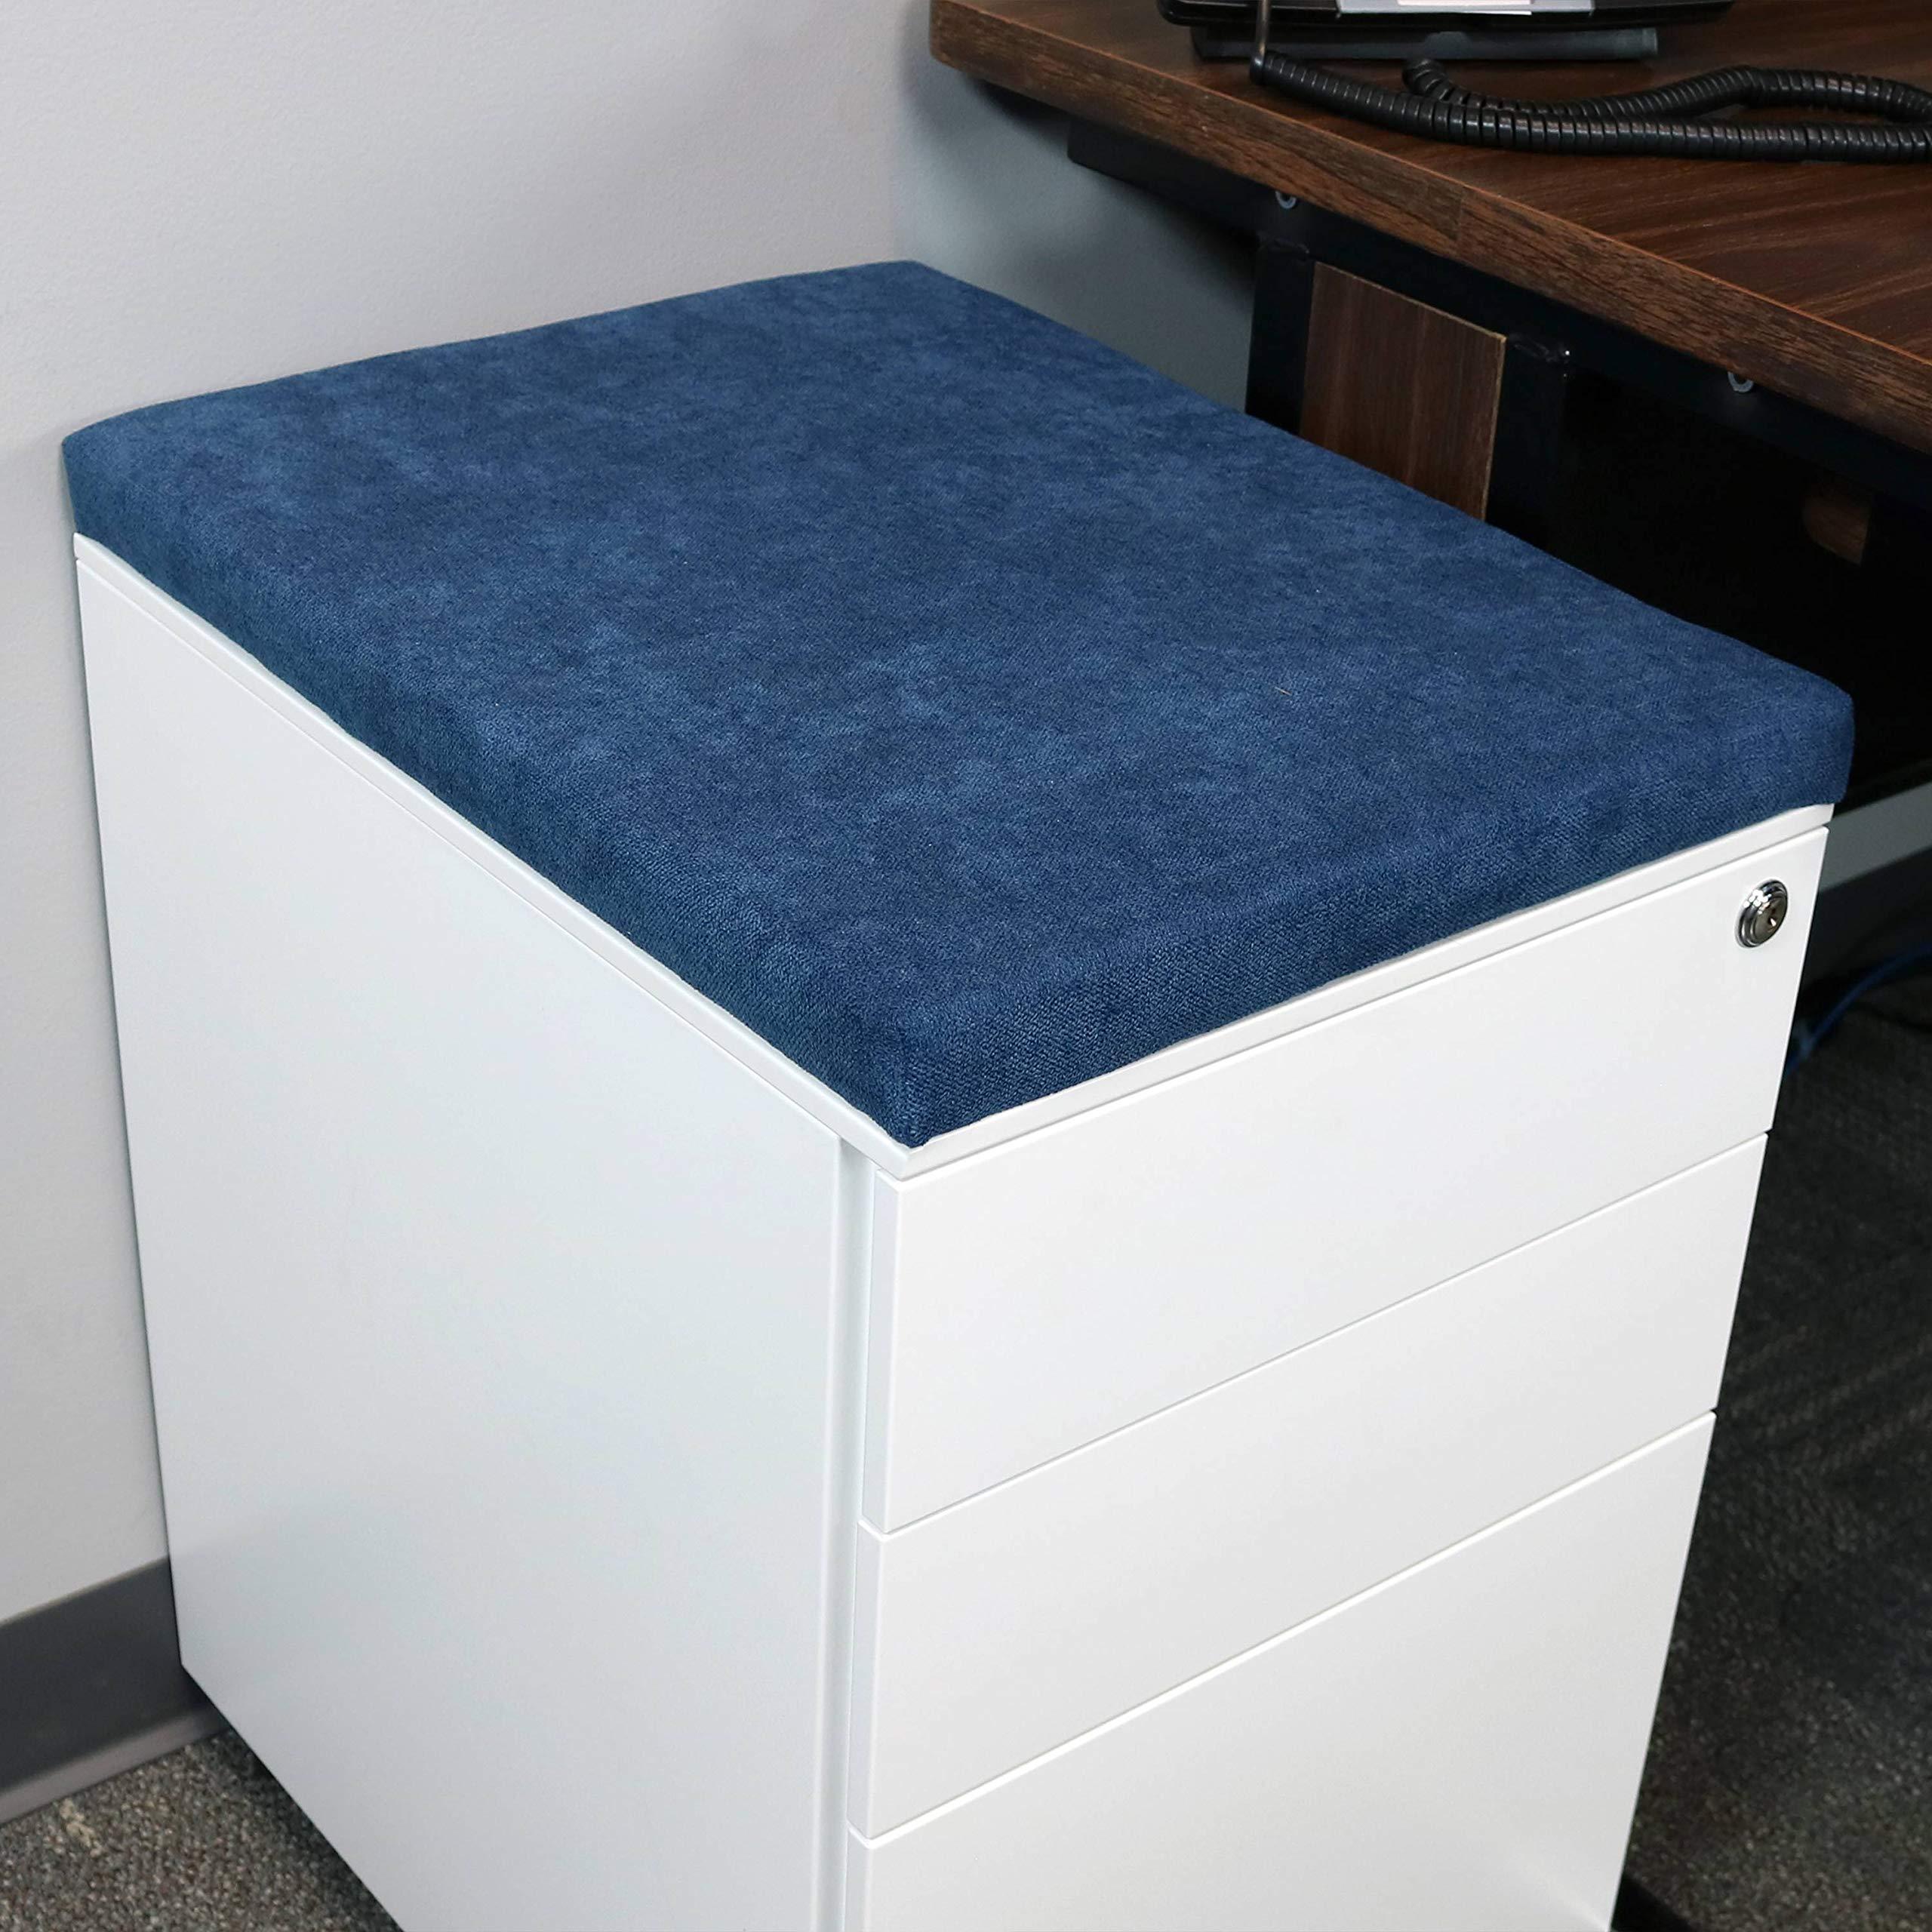 CASL Brands File Cabinet Cushion Seat Top for Mobile Pedestals, Magnetic Back, Blue by CASL Brands (Image #6)